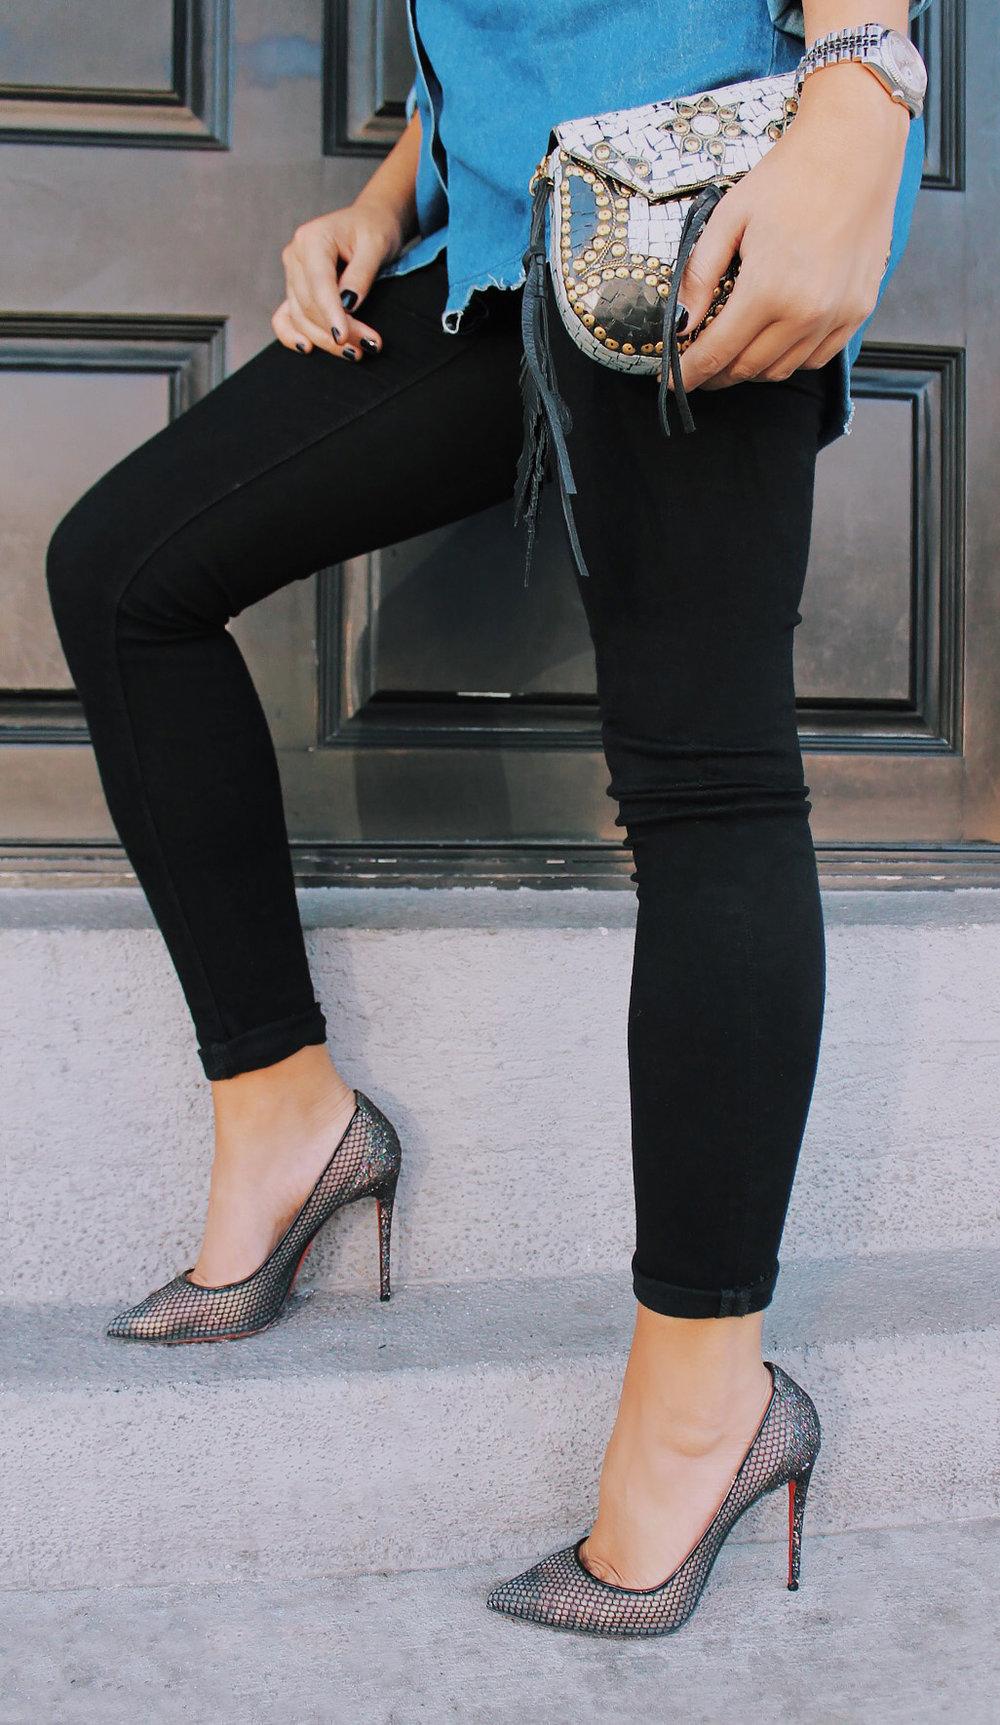 mel-ronnie-denim-red-lip-louboutins-skinny-jeans-black-gold-1.jpg